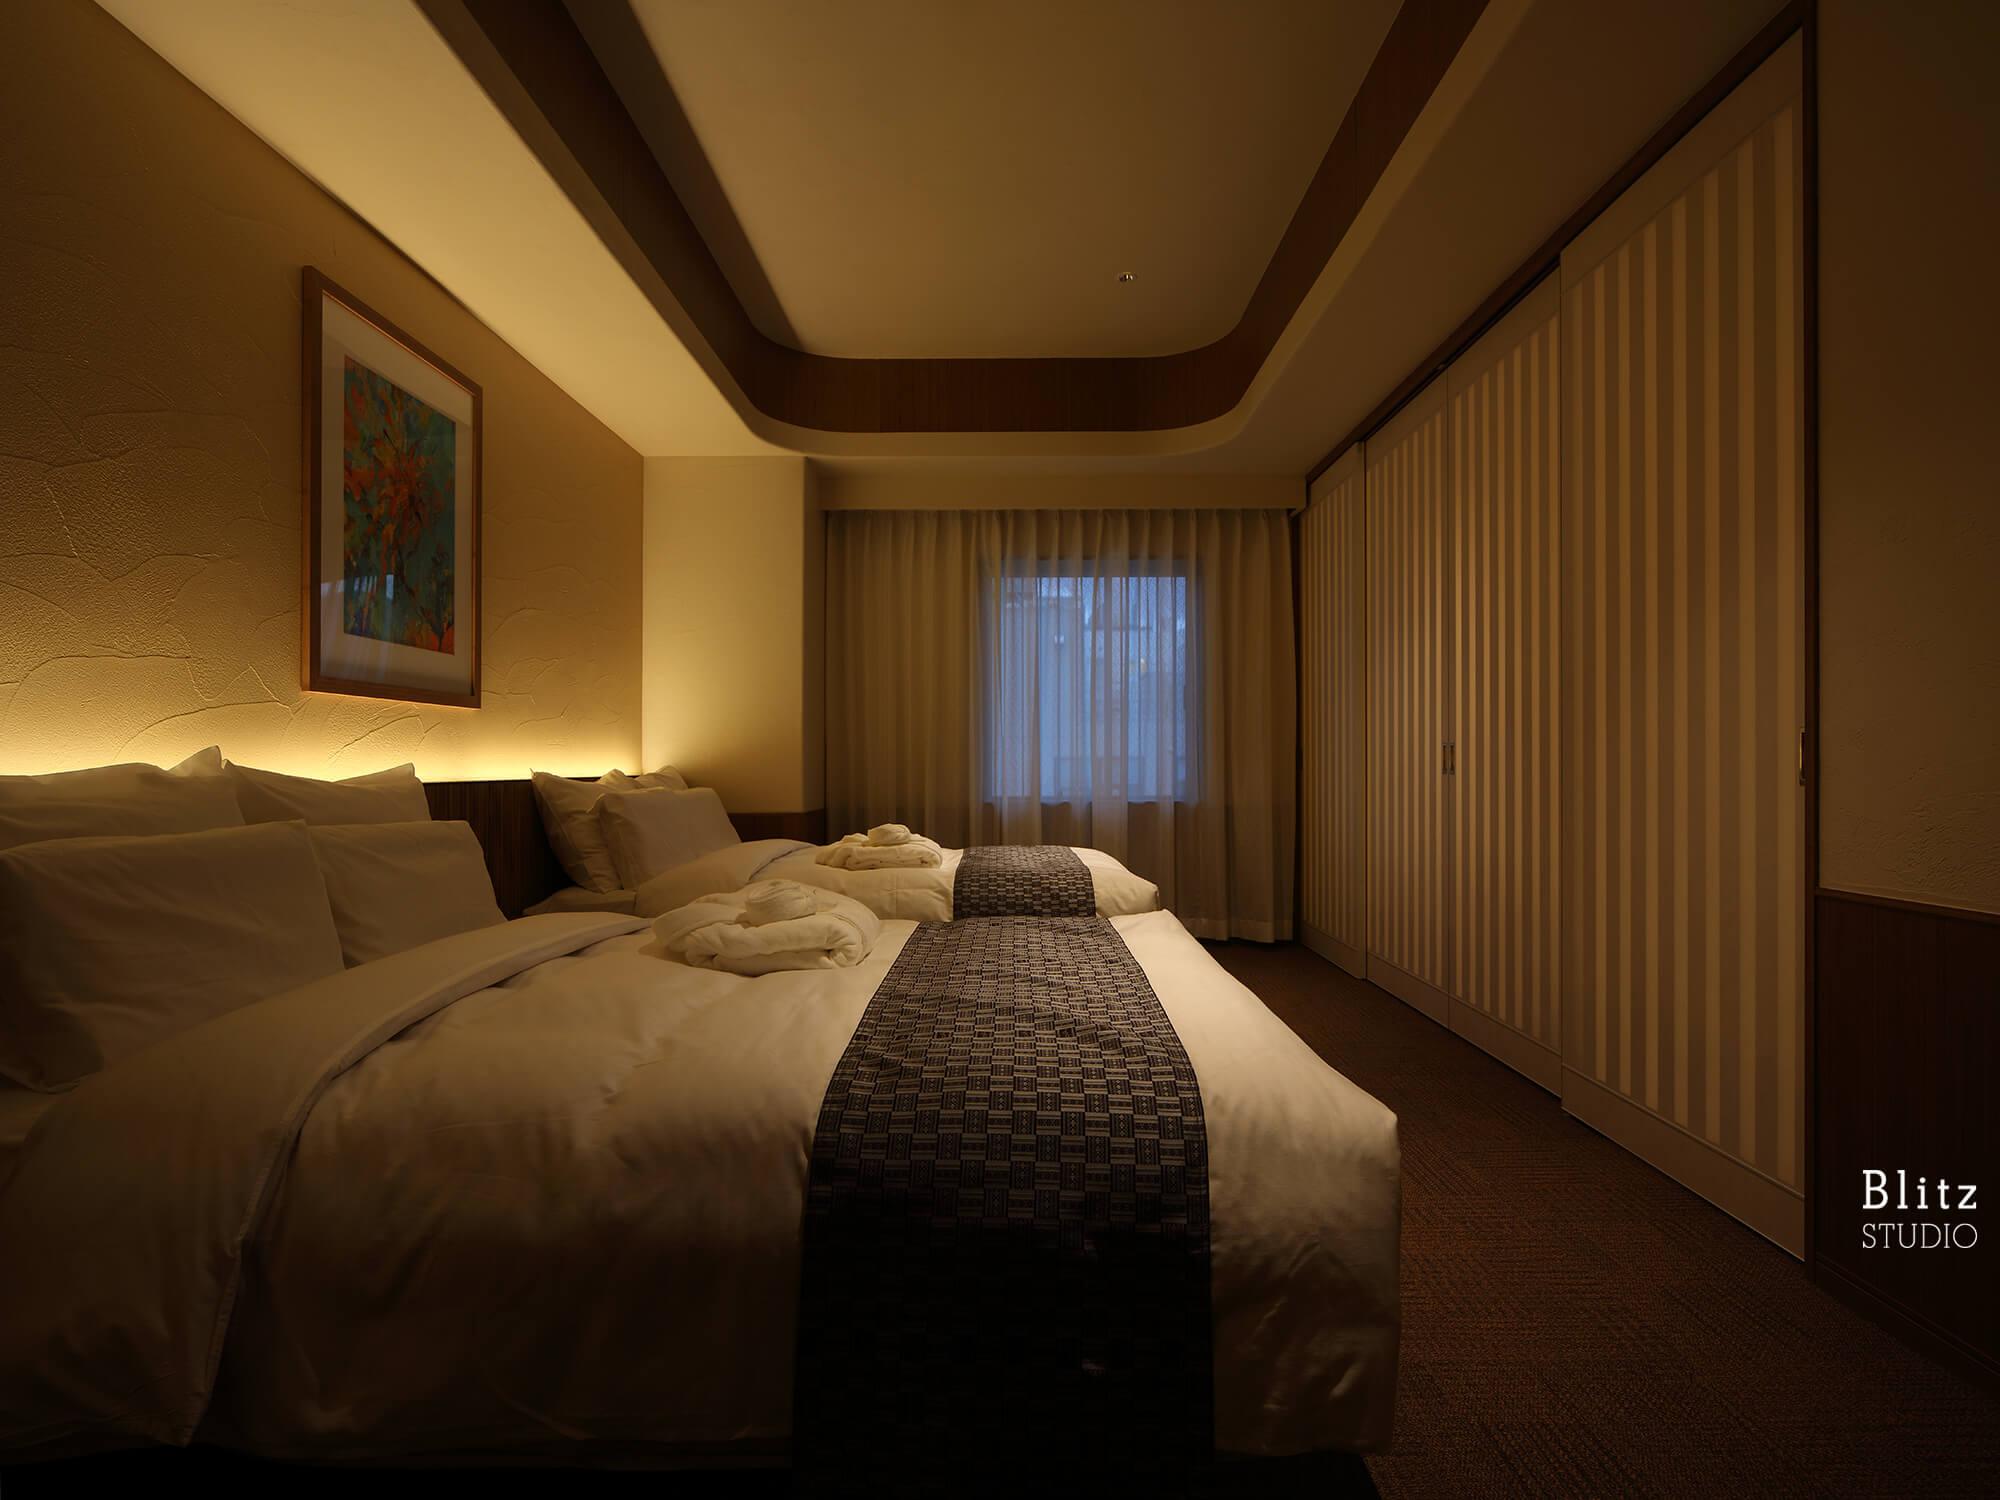 『HOTEL GREAT MORNING』建築写真・竣工写真・インテリア写真18